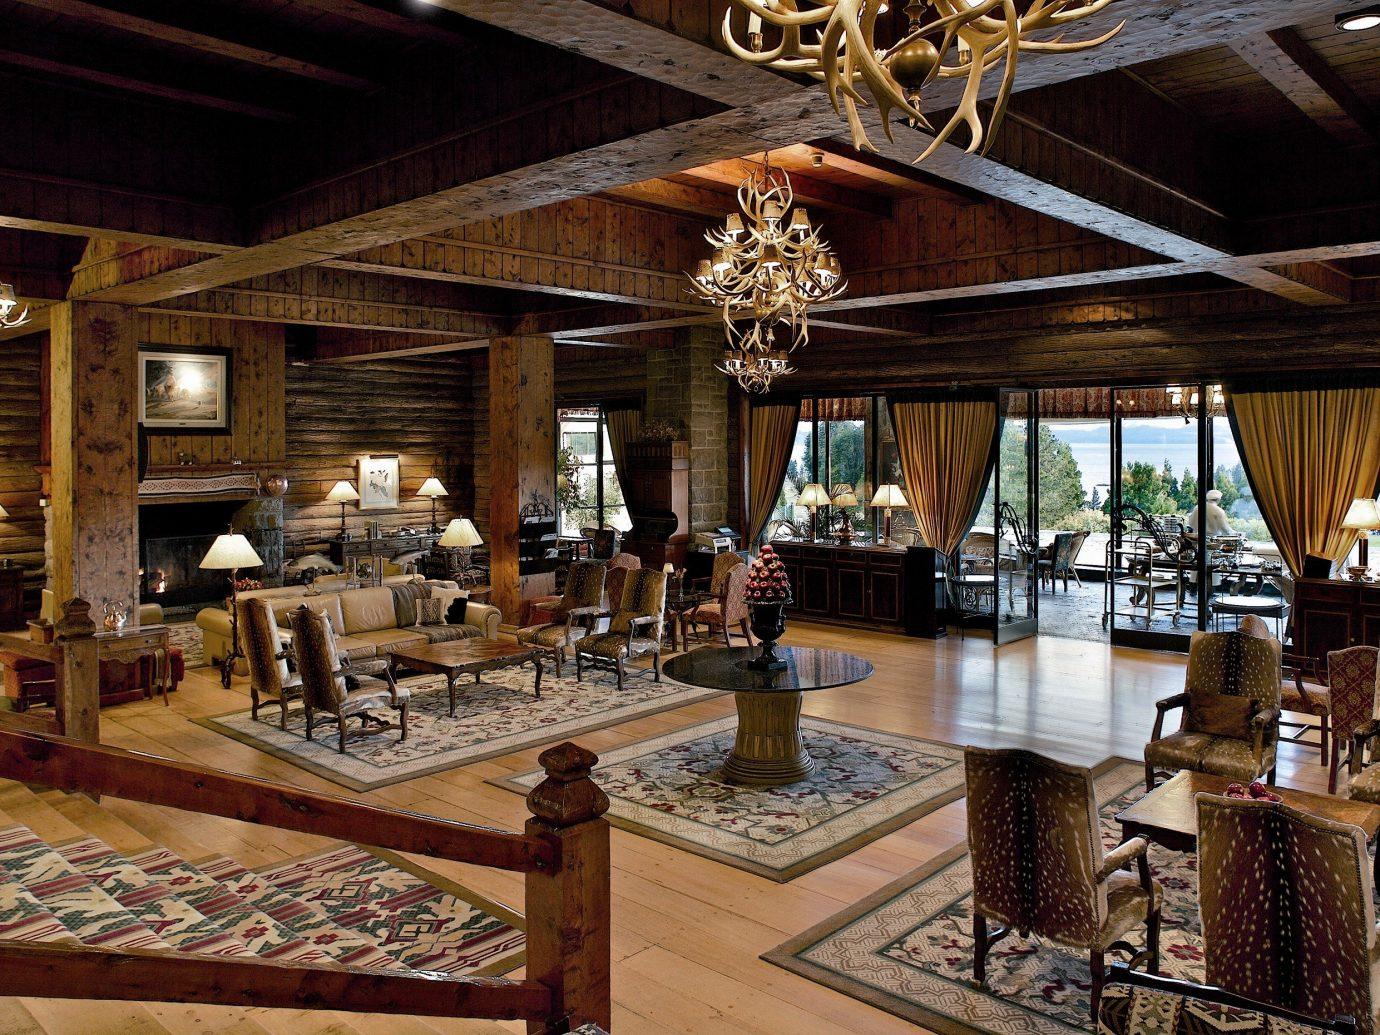 Secret Getaways Trip Ideas Winter ceiling indoor interior design Lobby living room furniture estate restaurant area several